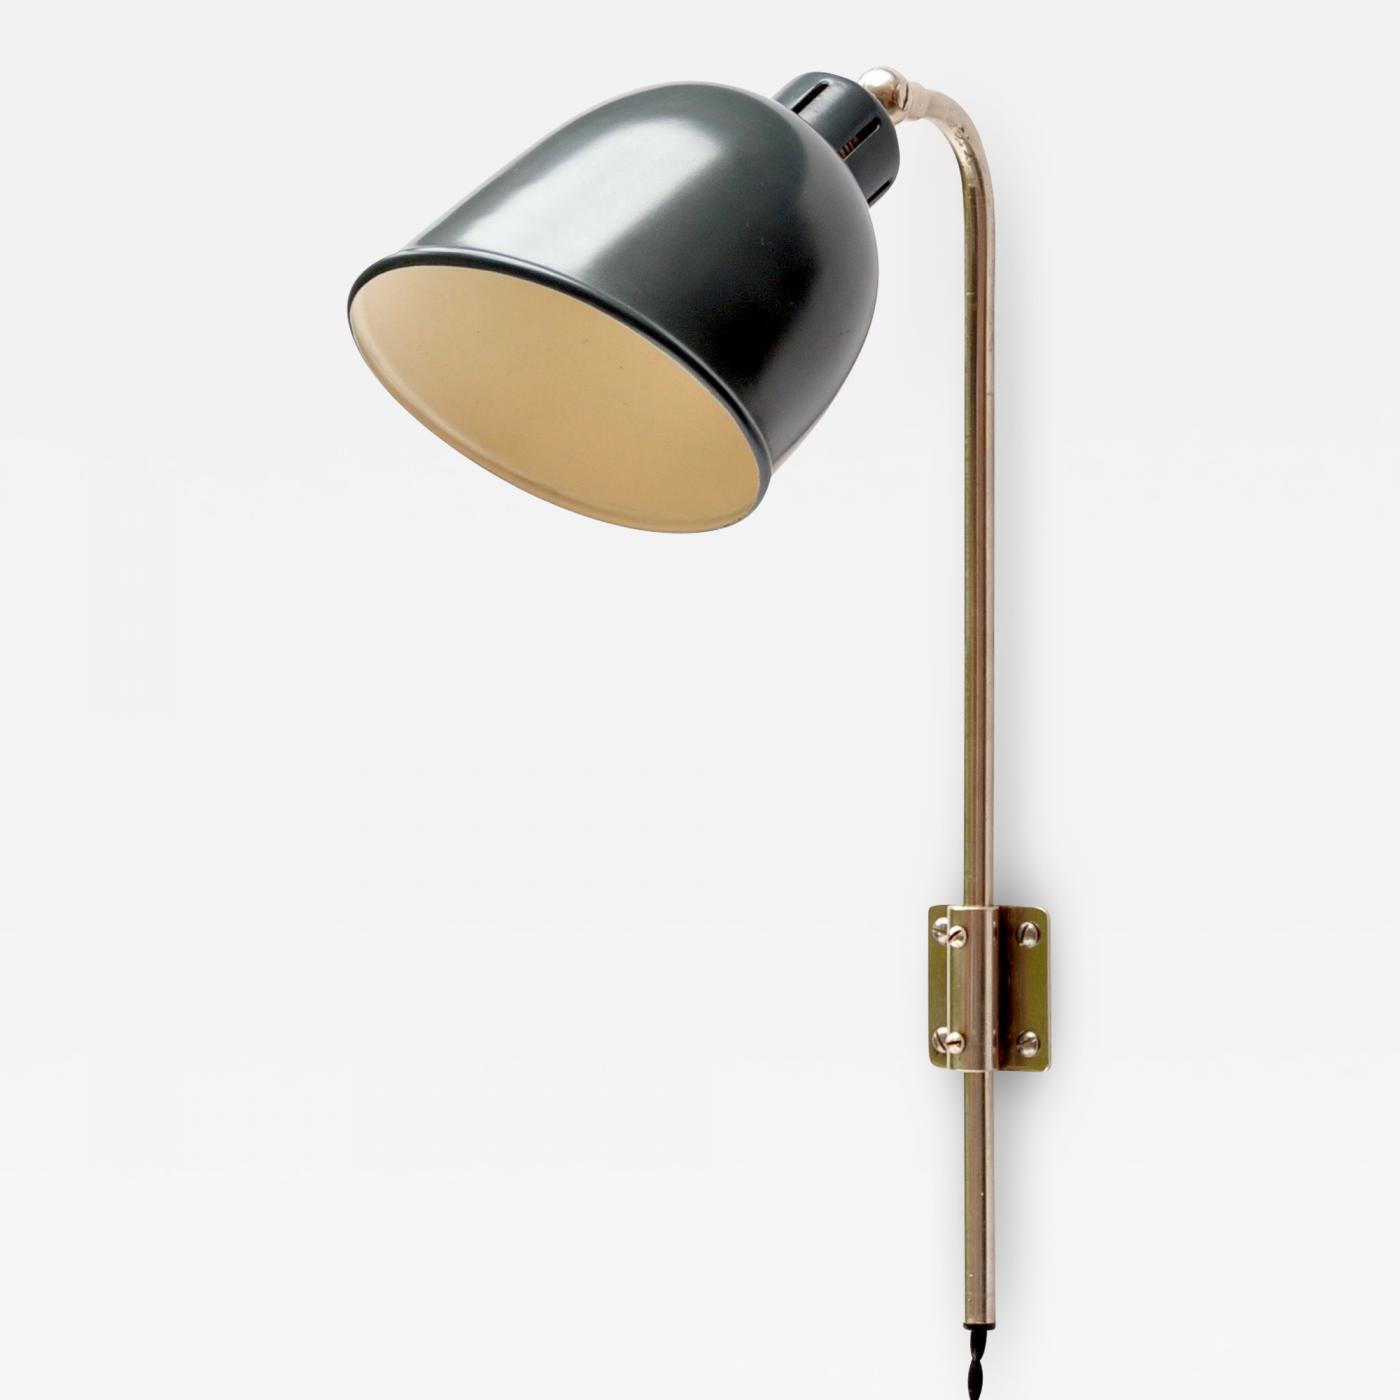 Alfred Muller Wall Lamp by AMBA Basel, Switzerland 1940s Image